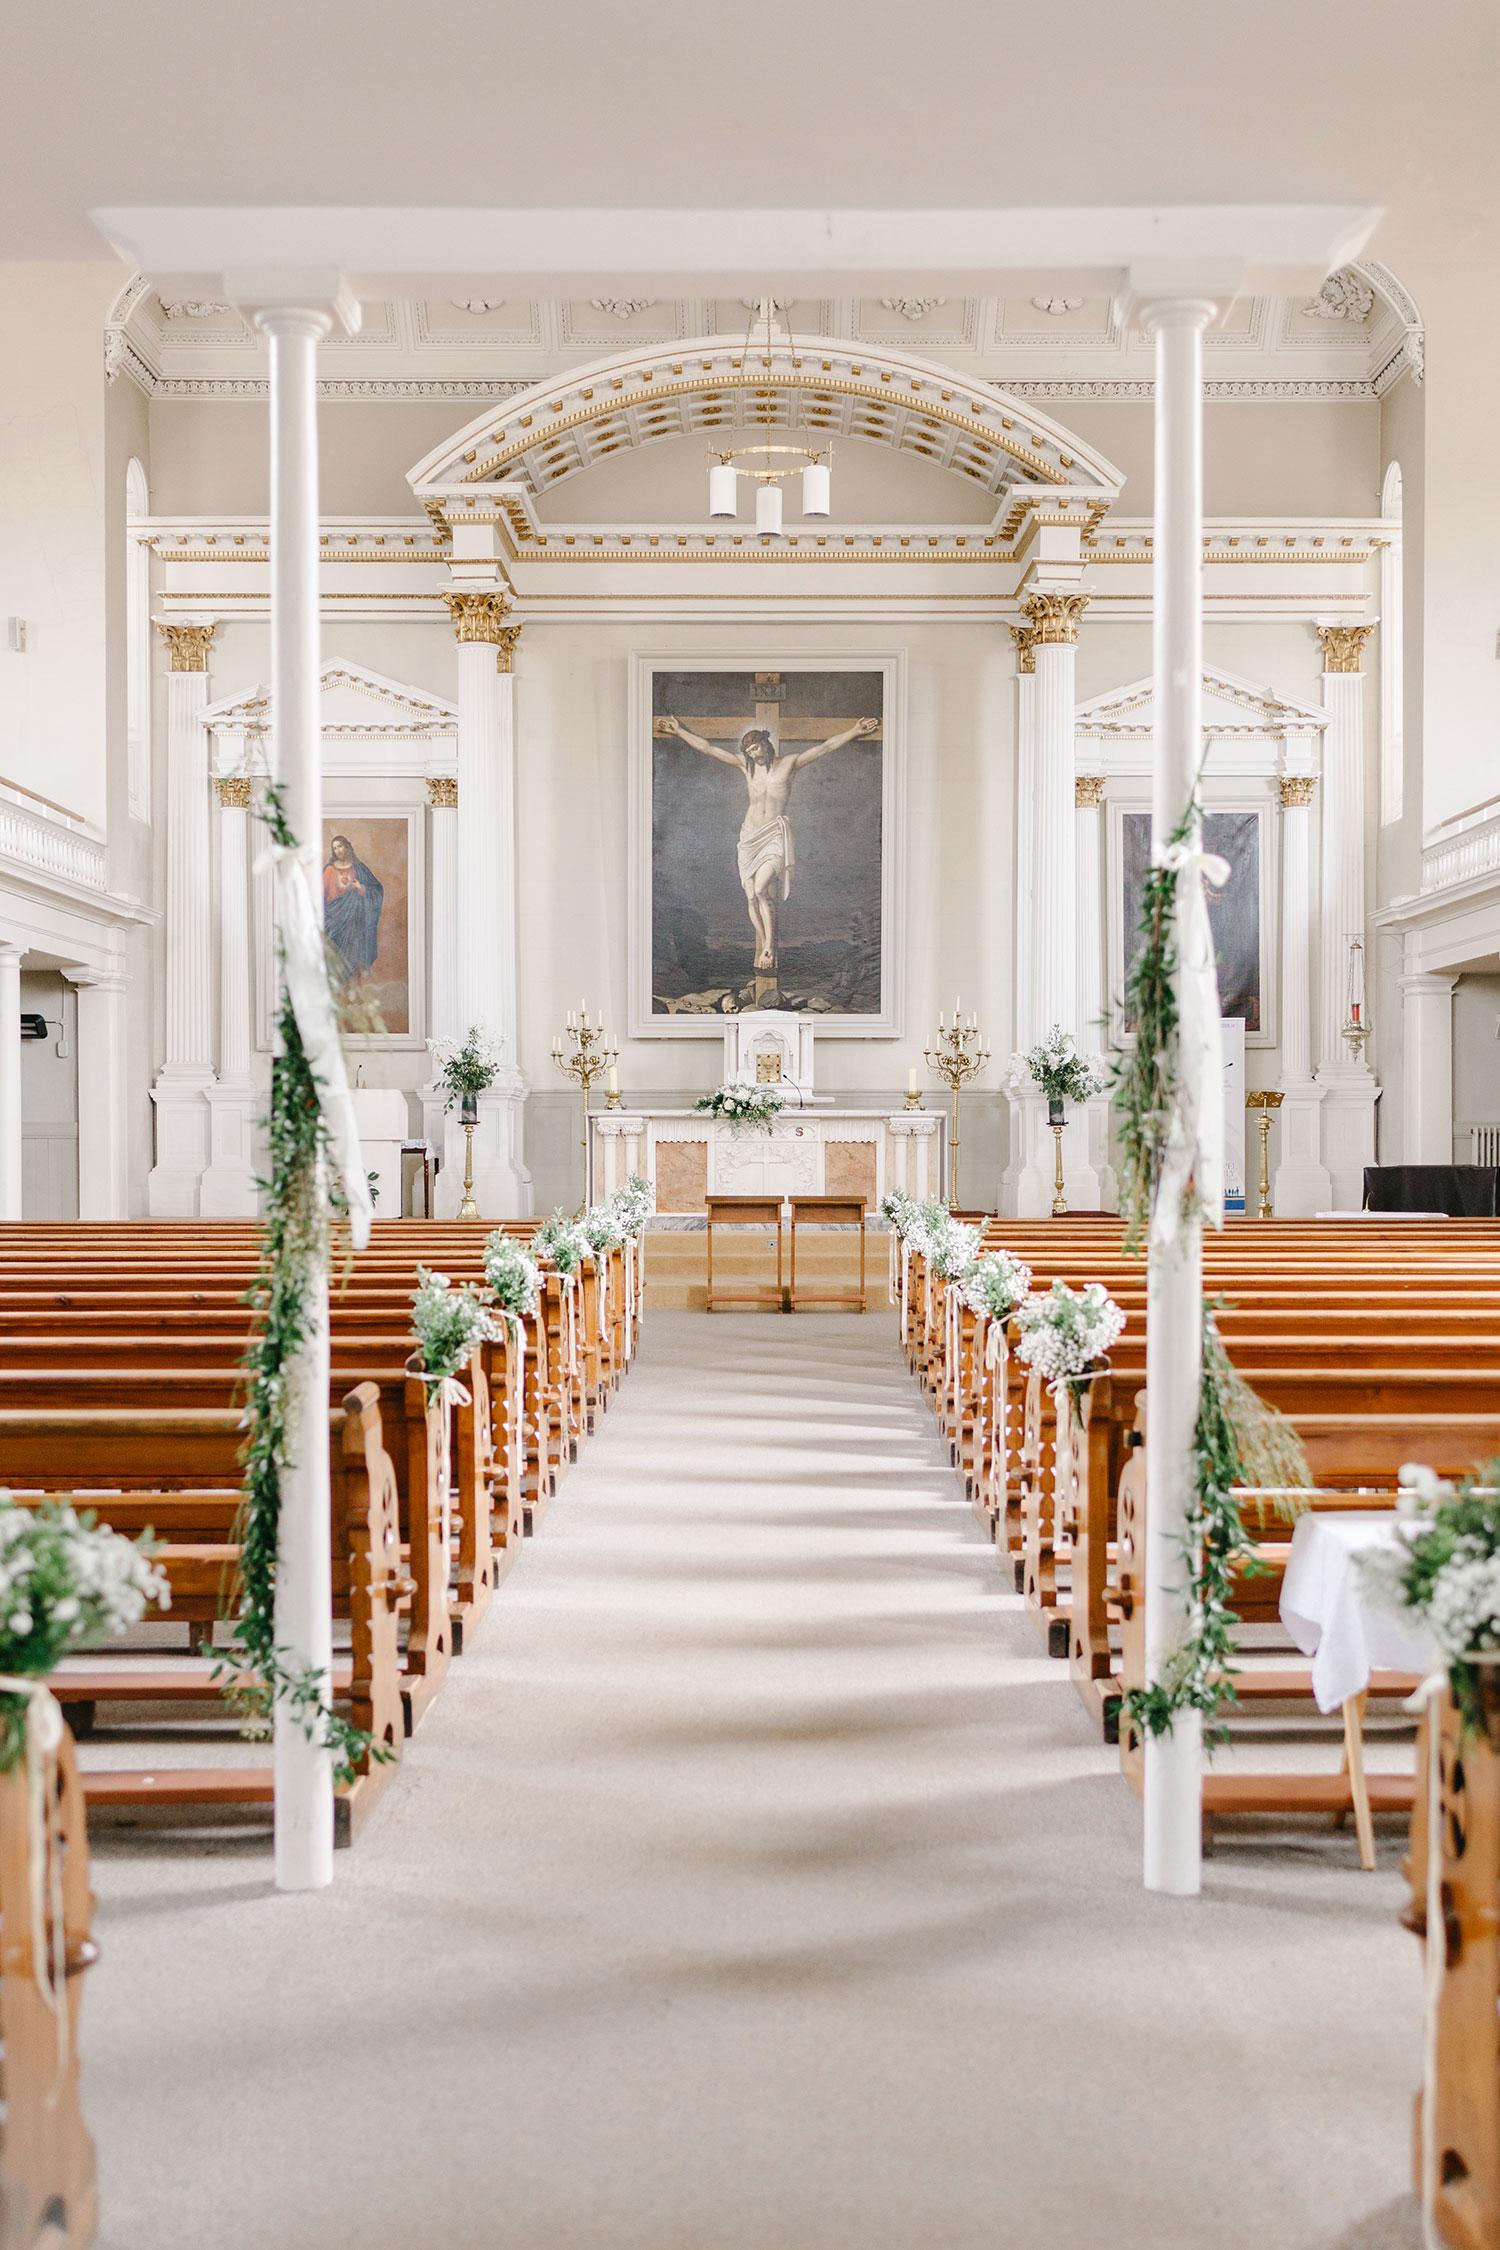 destination-wedding-photographer-ballinacurra-house-wedding-20180711_0021.jpg